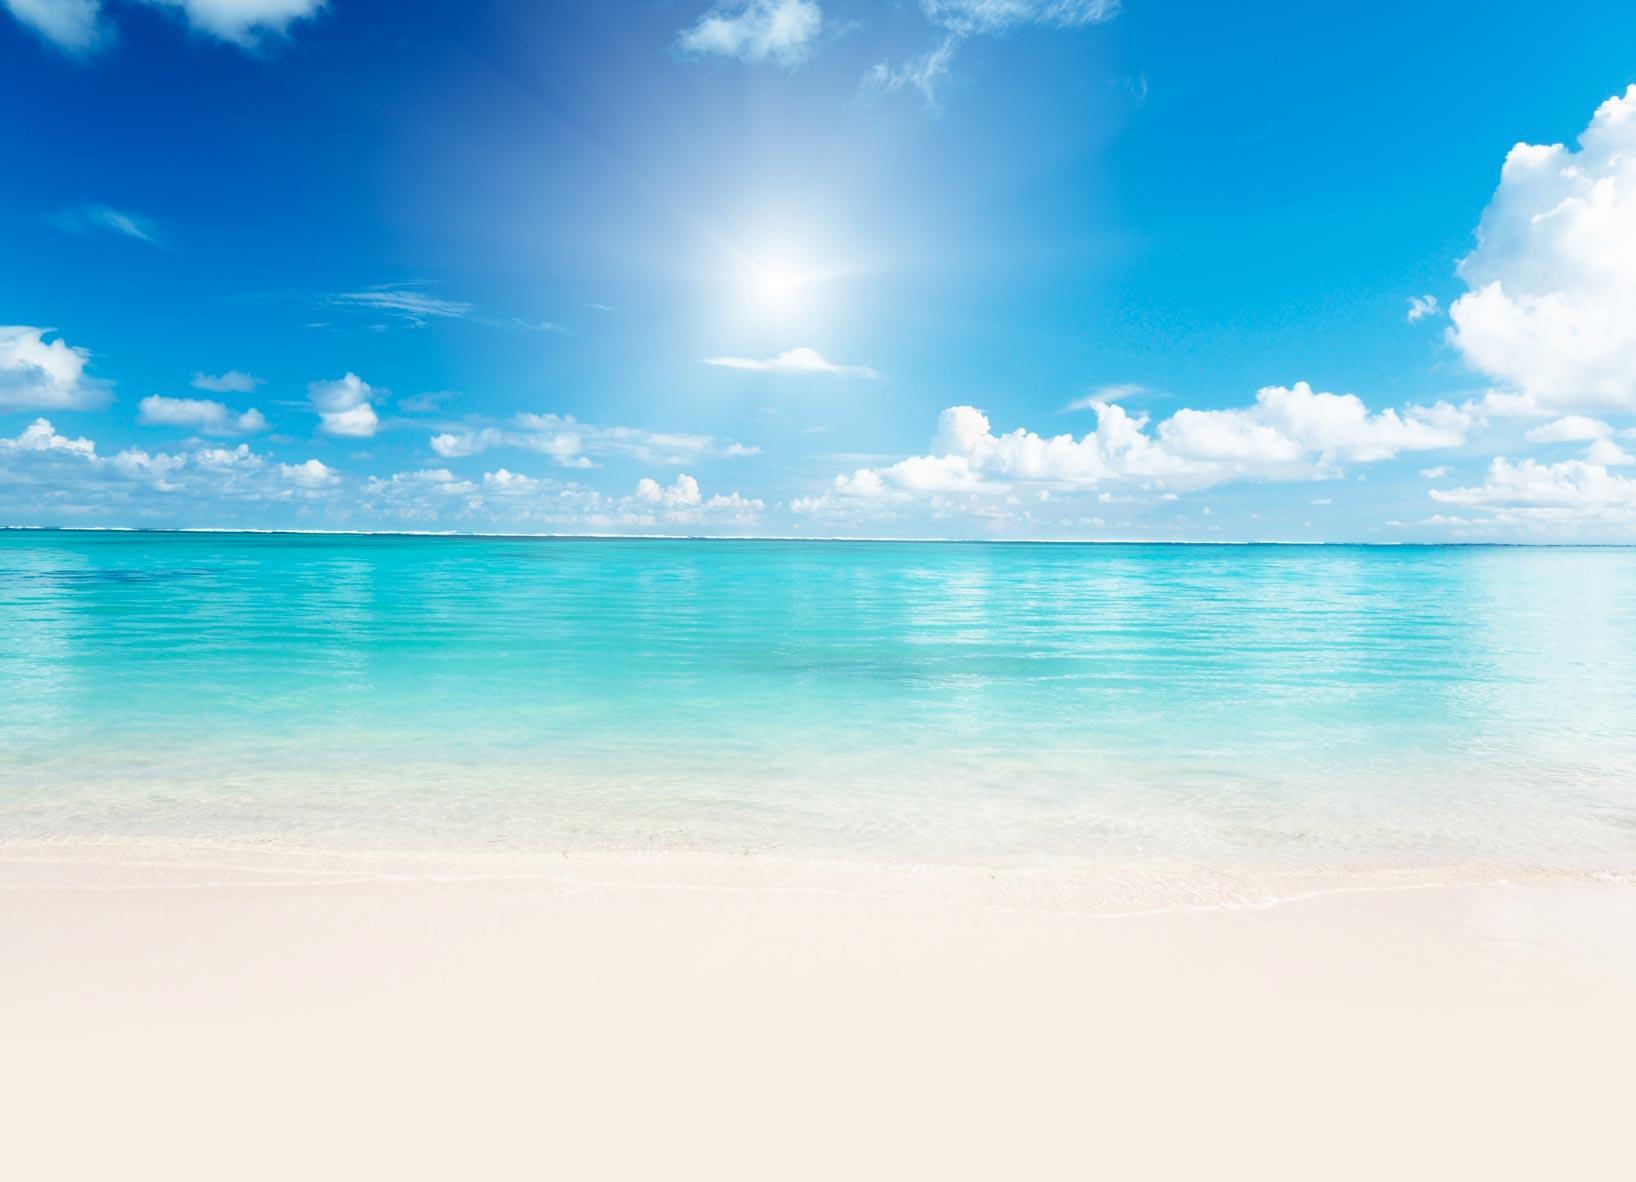 relaxing-background.jpg relaxing-background.jpg – Wellbeing Holidays